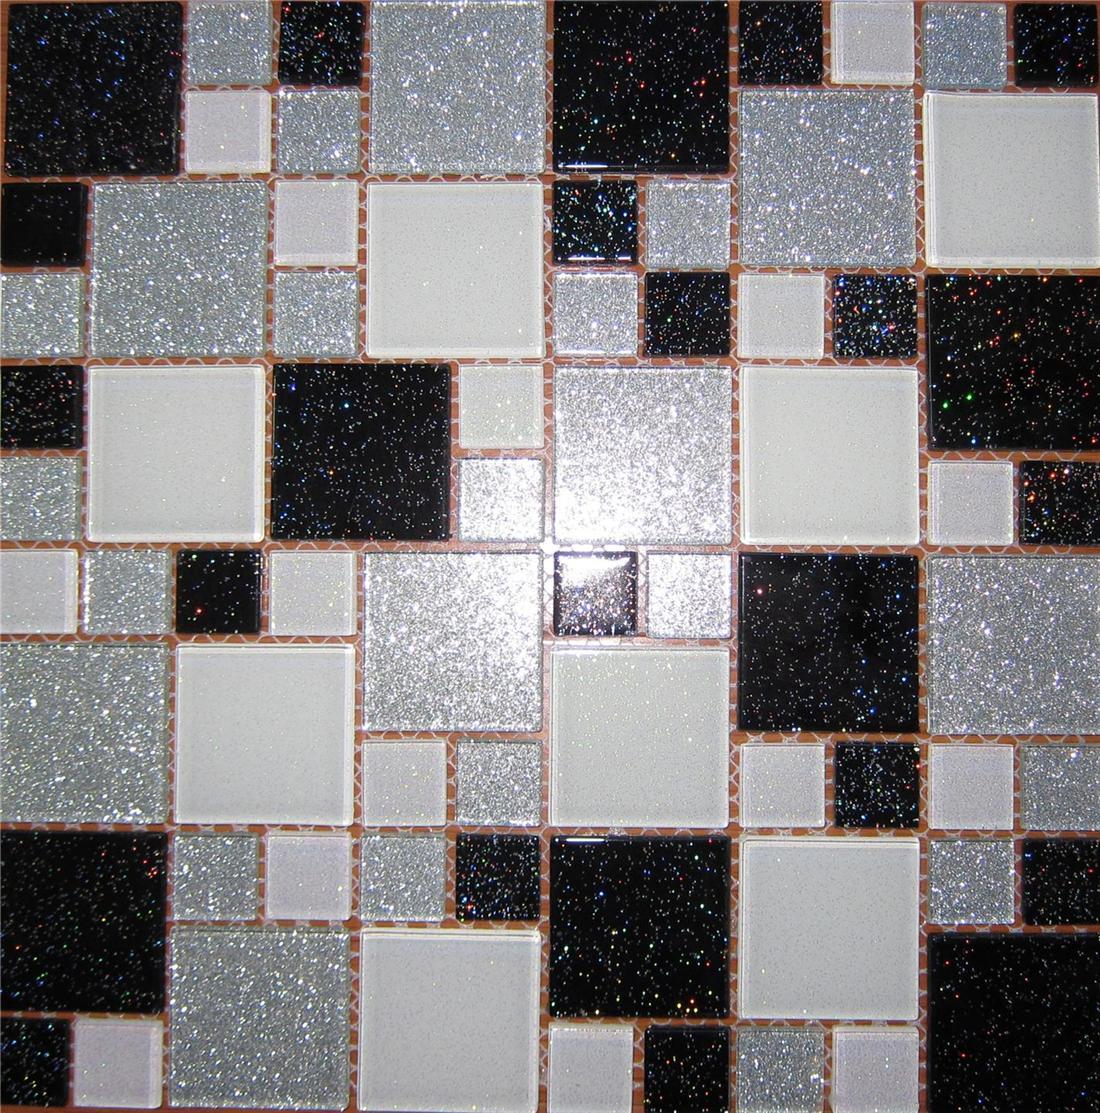 Bathroom Tiles Mosaic Border: Trade Budget Glitter Mosaic Tile Sheets Glass Bathroom